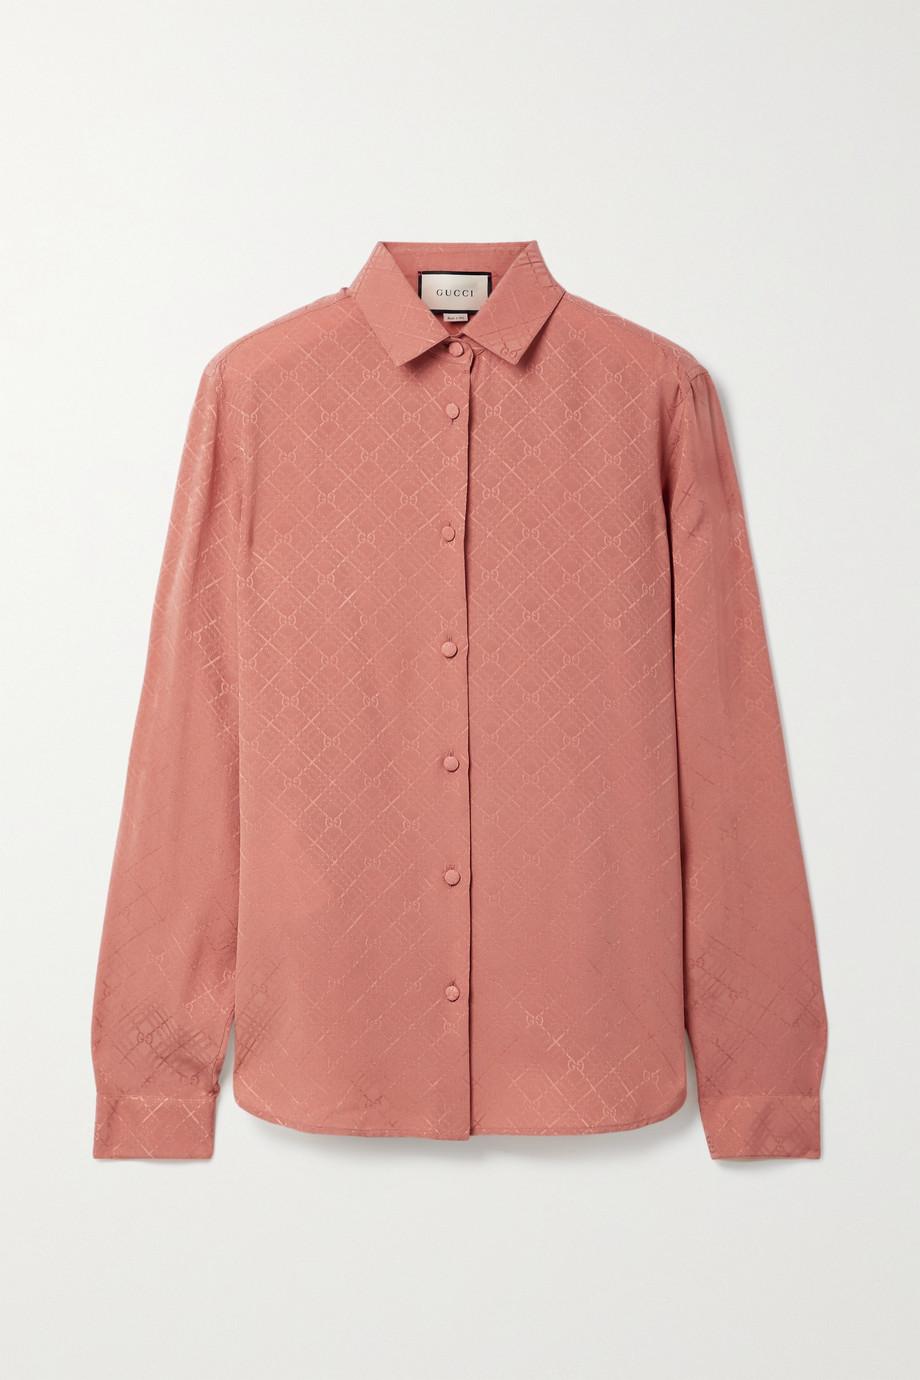 Gucci Hemd aus Seiden-Crêpe mit Karomuster